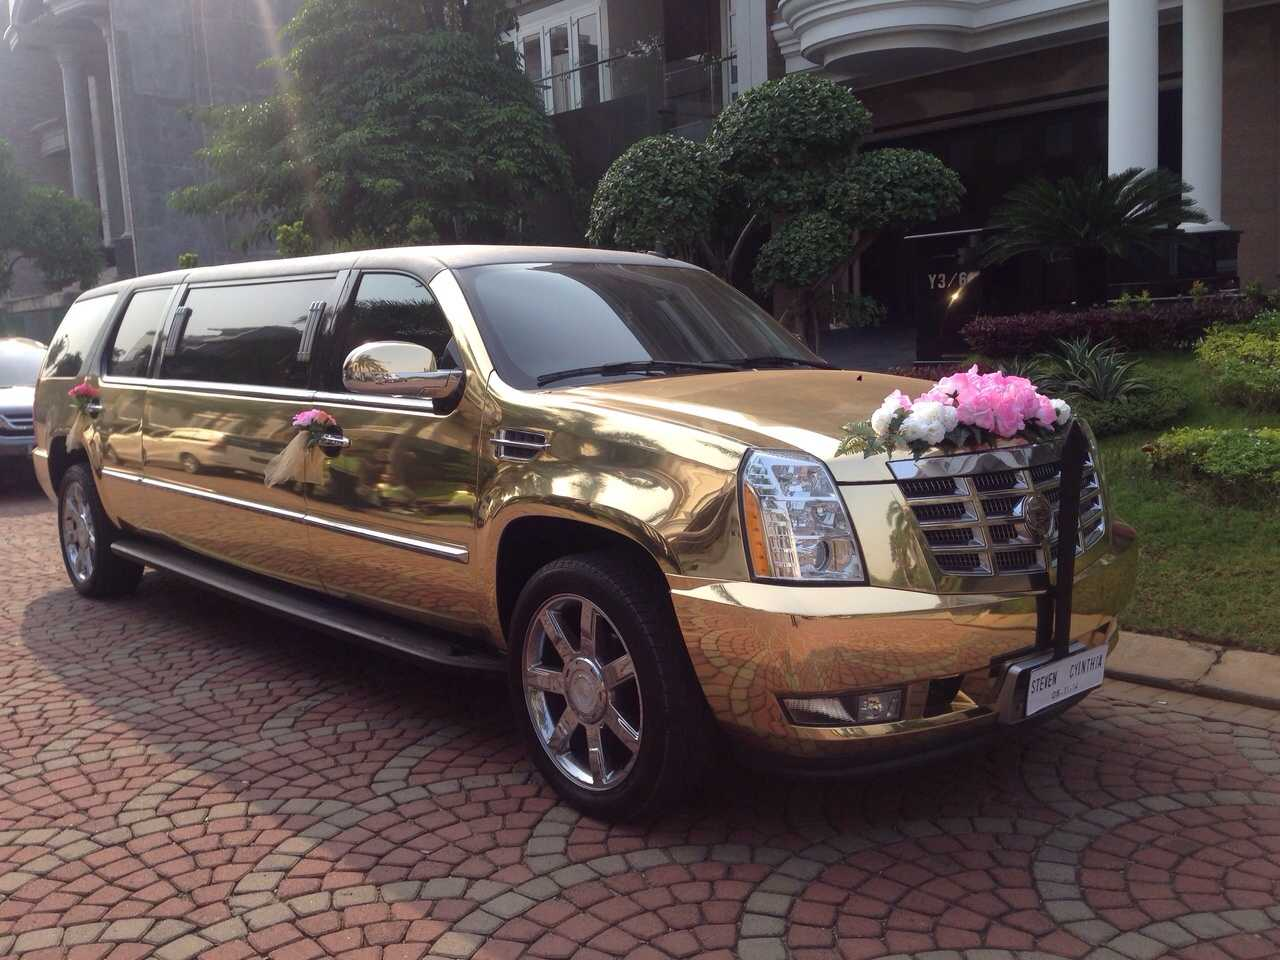 suv-wedding-car-sewa-mobil-pengantin-mewah-cadilac-limousine